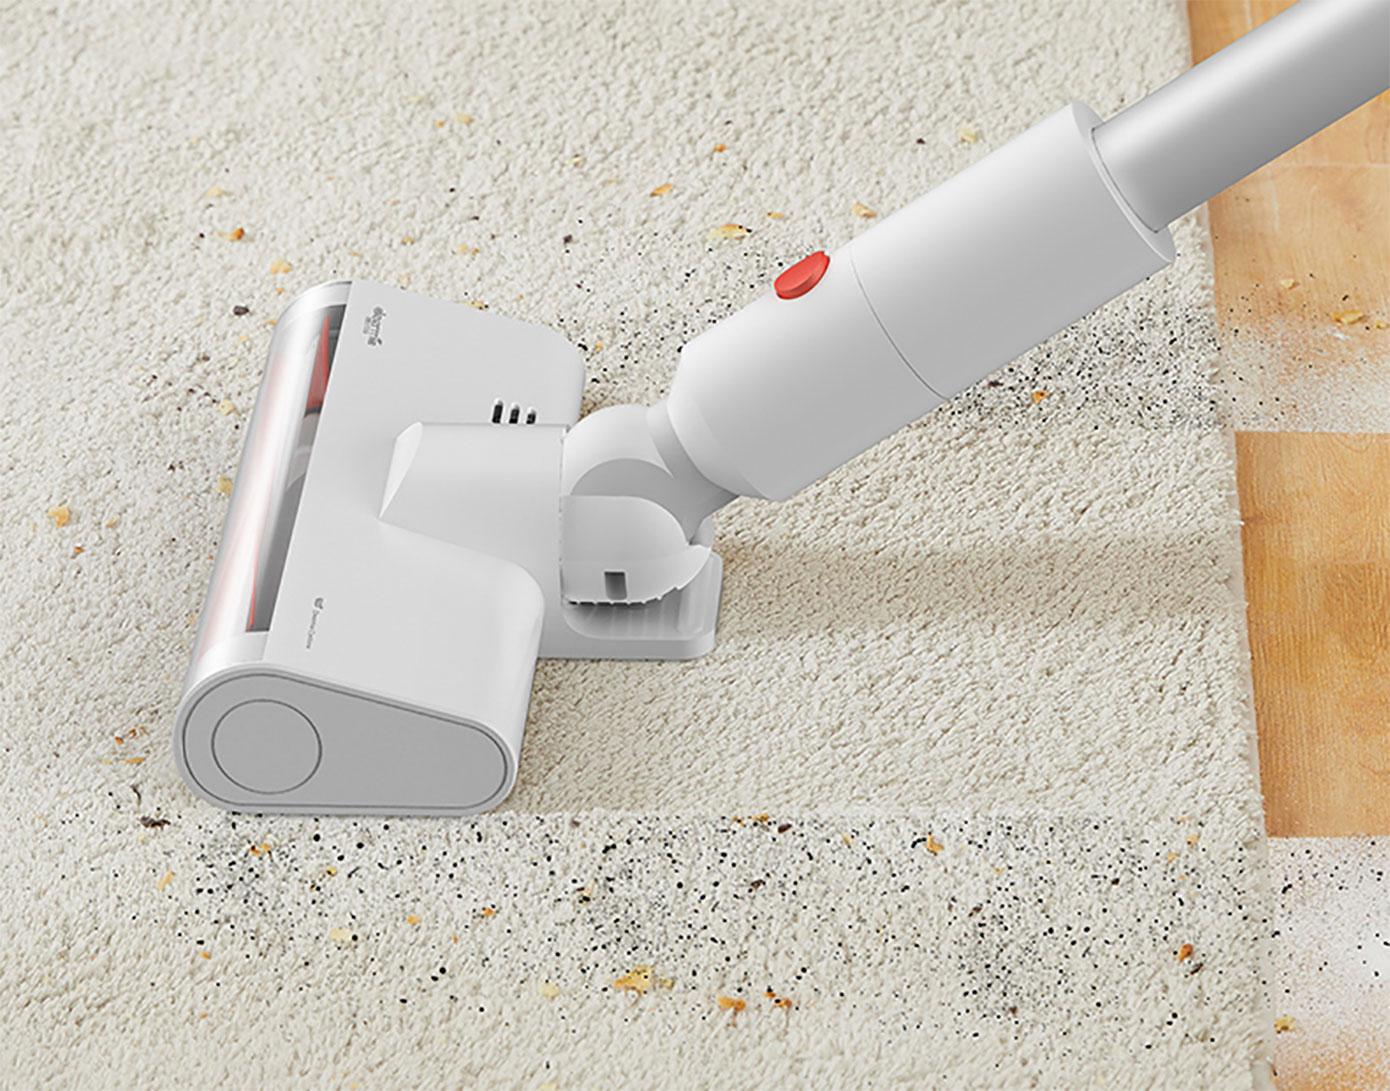 Opisanie Besprovodnoj Ruchnoj Pylesos Deerma Vc25 Wireless Vacuum Cleaner Dem Vc25 8